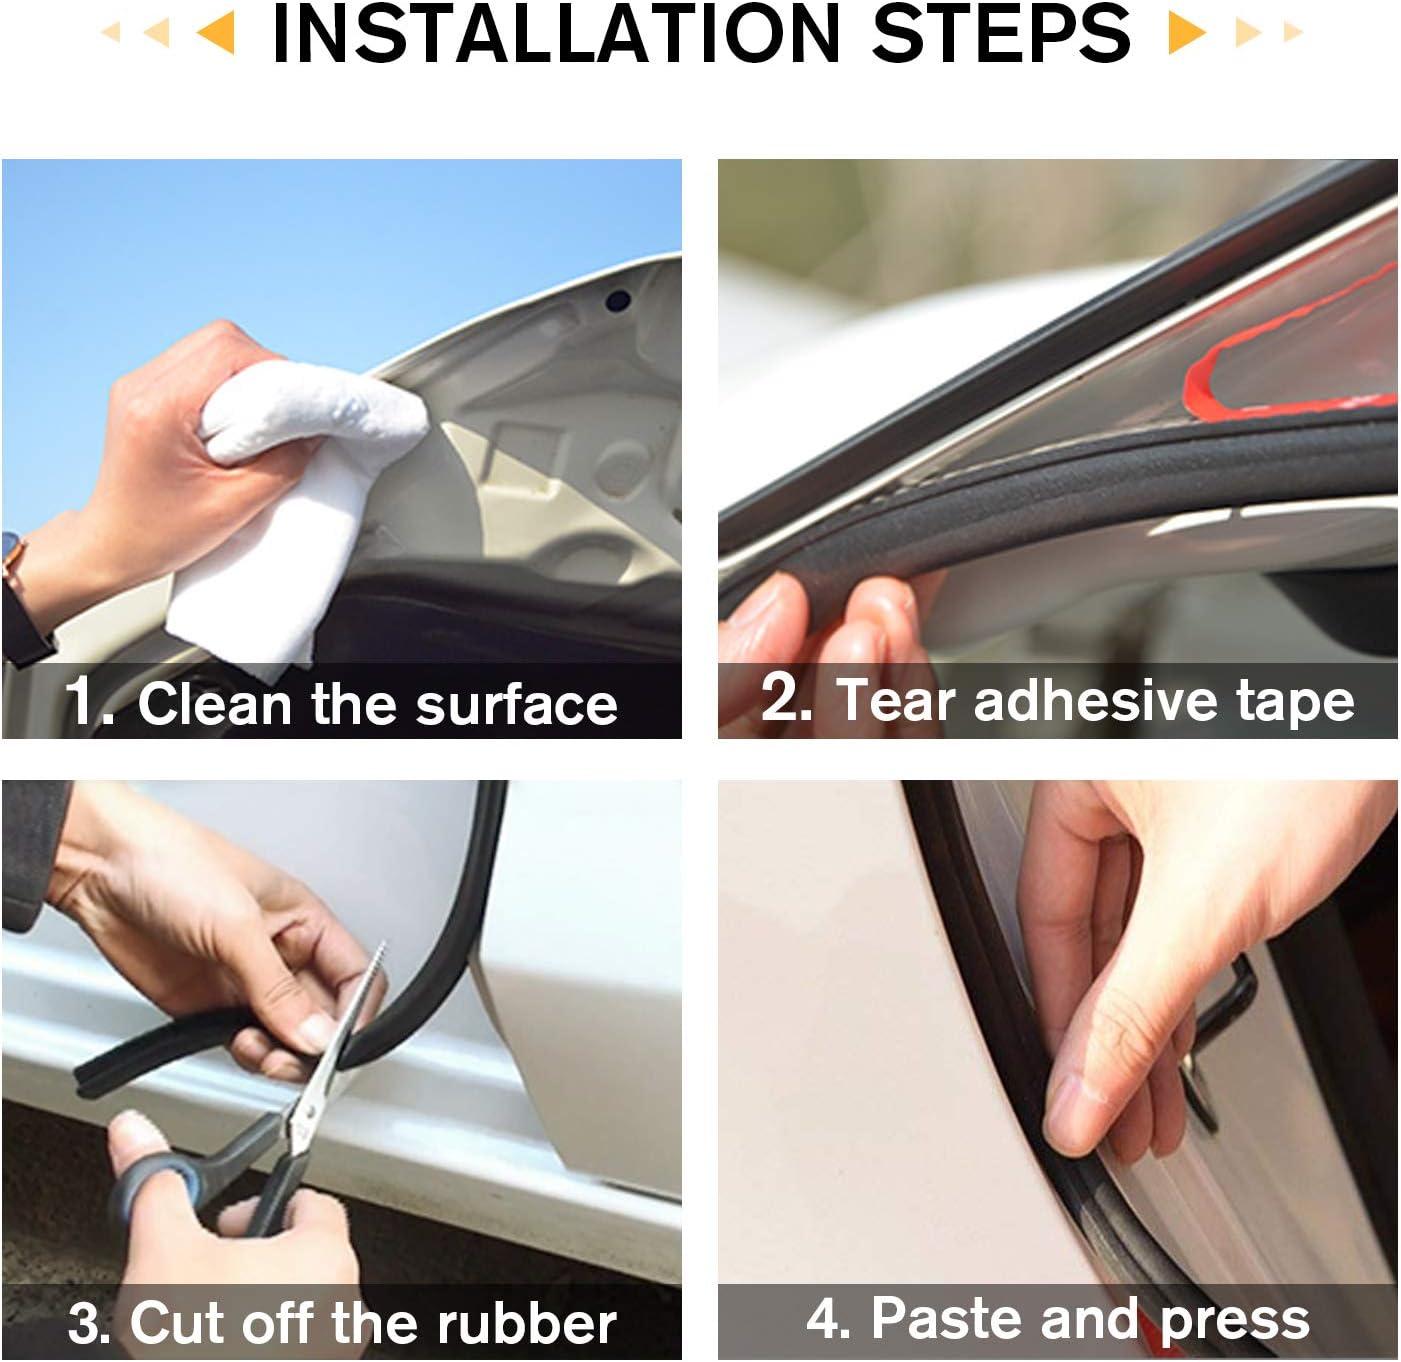 2 Pack JMgist Total 32.8 Ft Automotive Seal Strip Rubber Edge Weatherstrip for Car Window Door Protector Soundproofing Engine Cover Trim B Shape